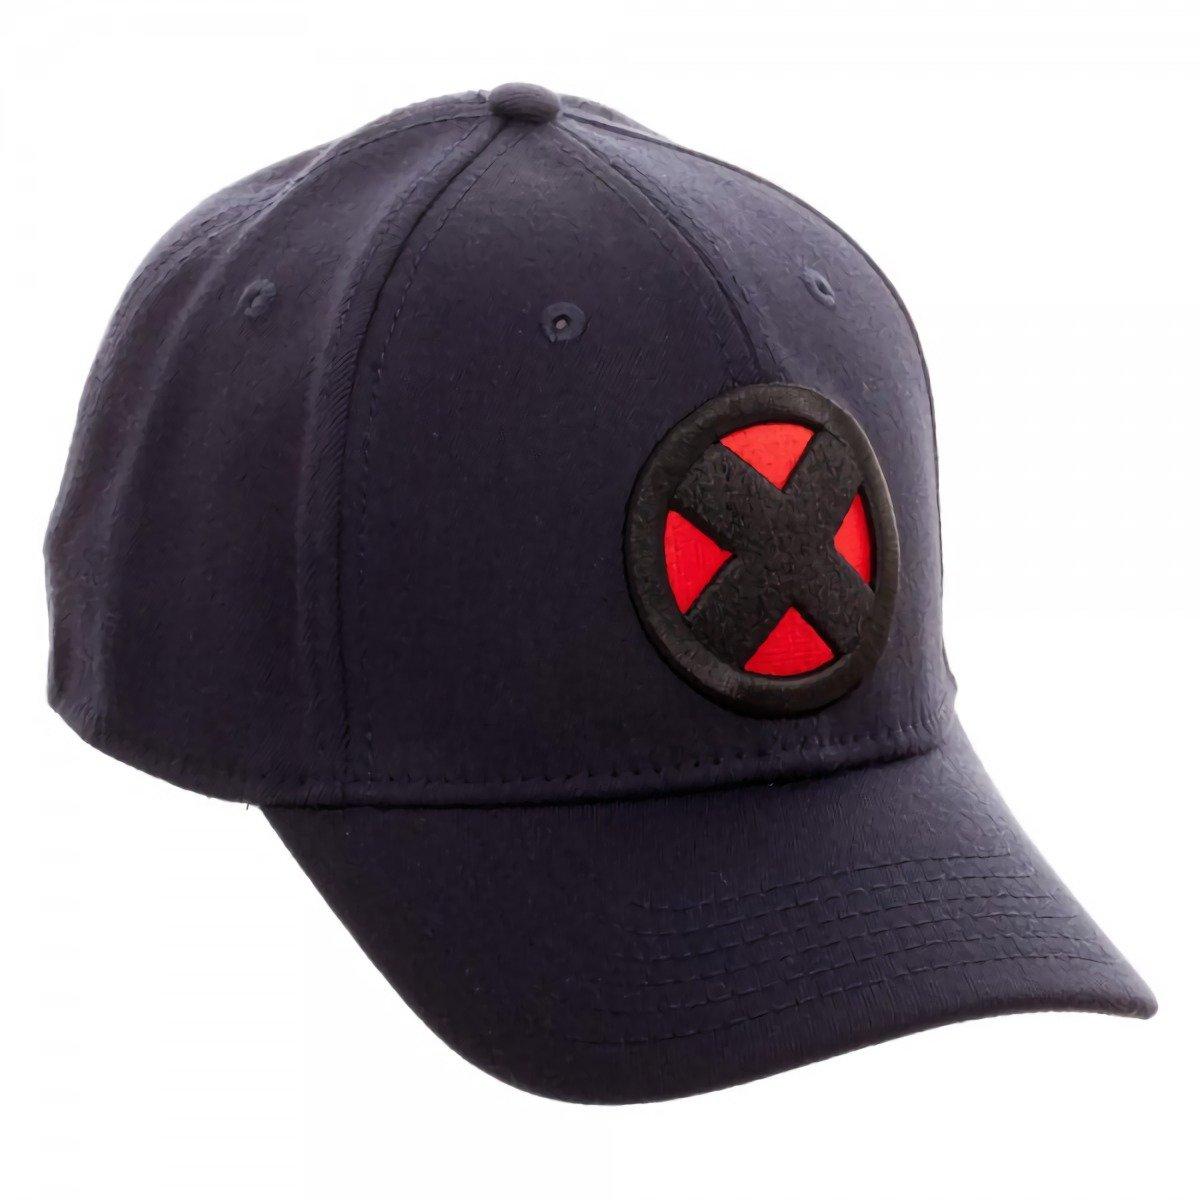 5be41dc82d6c9 Amazon.com  Marvel X-men X Logo Navy Flex Cap  Clothing